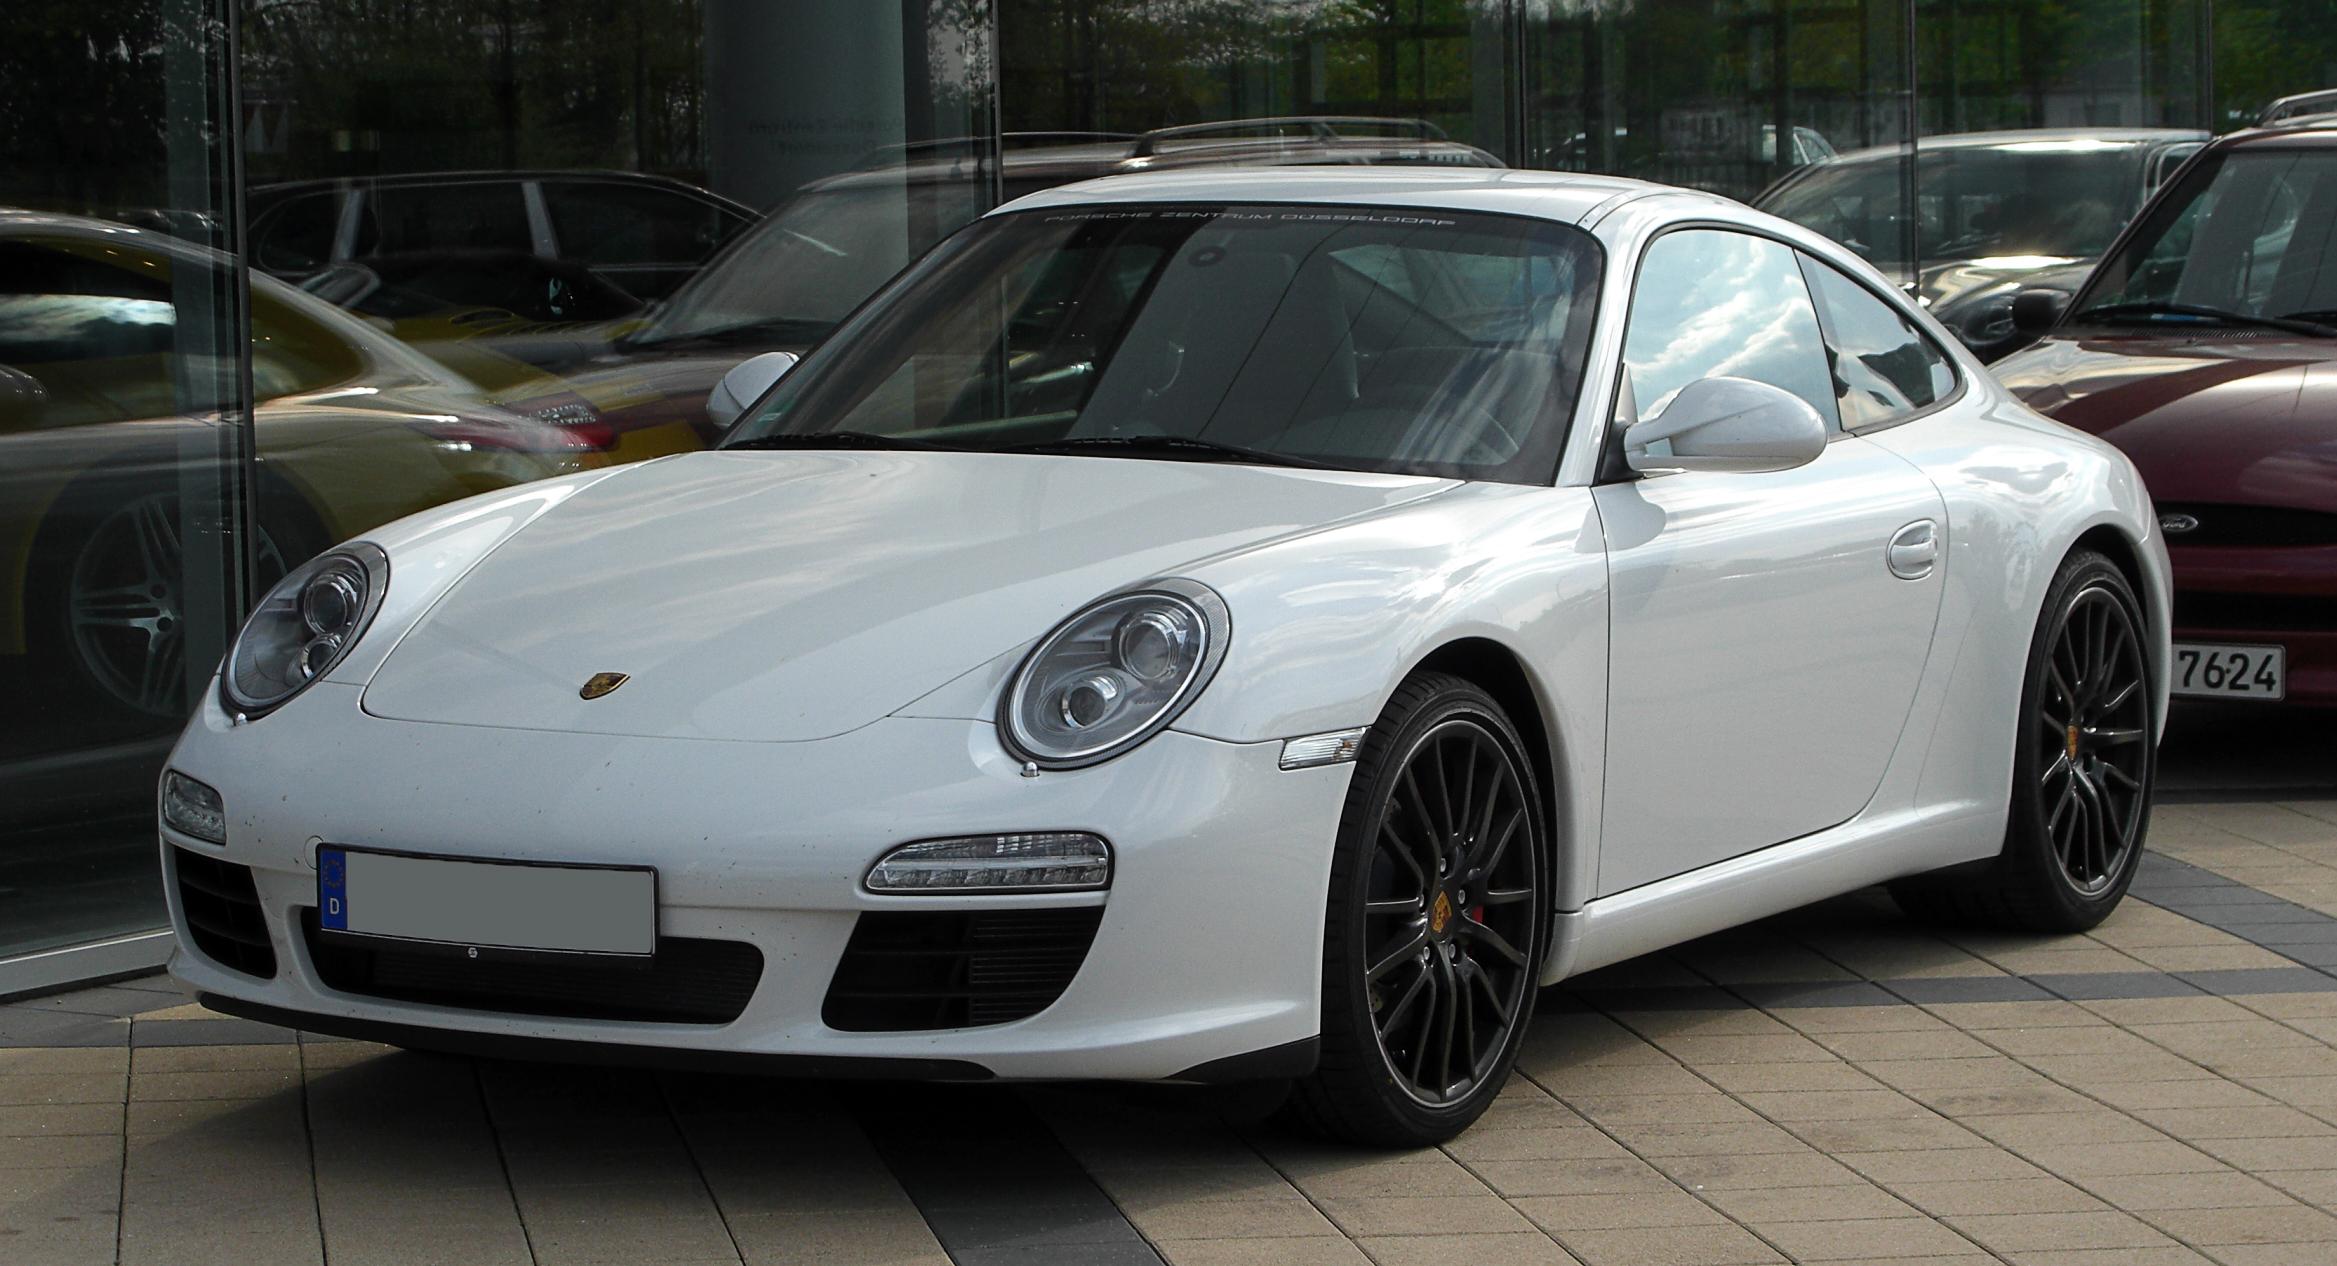 Porsche_911_Carrera_S_Coup%C3%A9_(997,_F